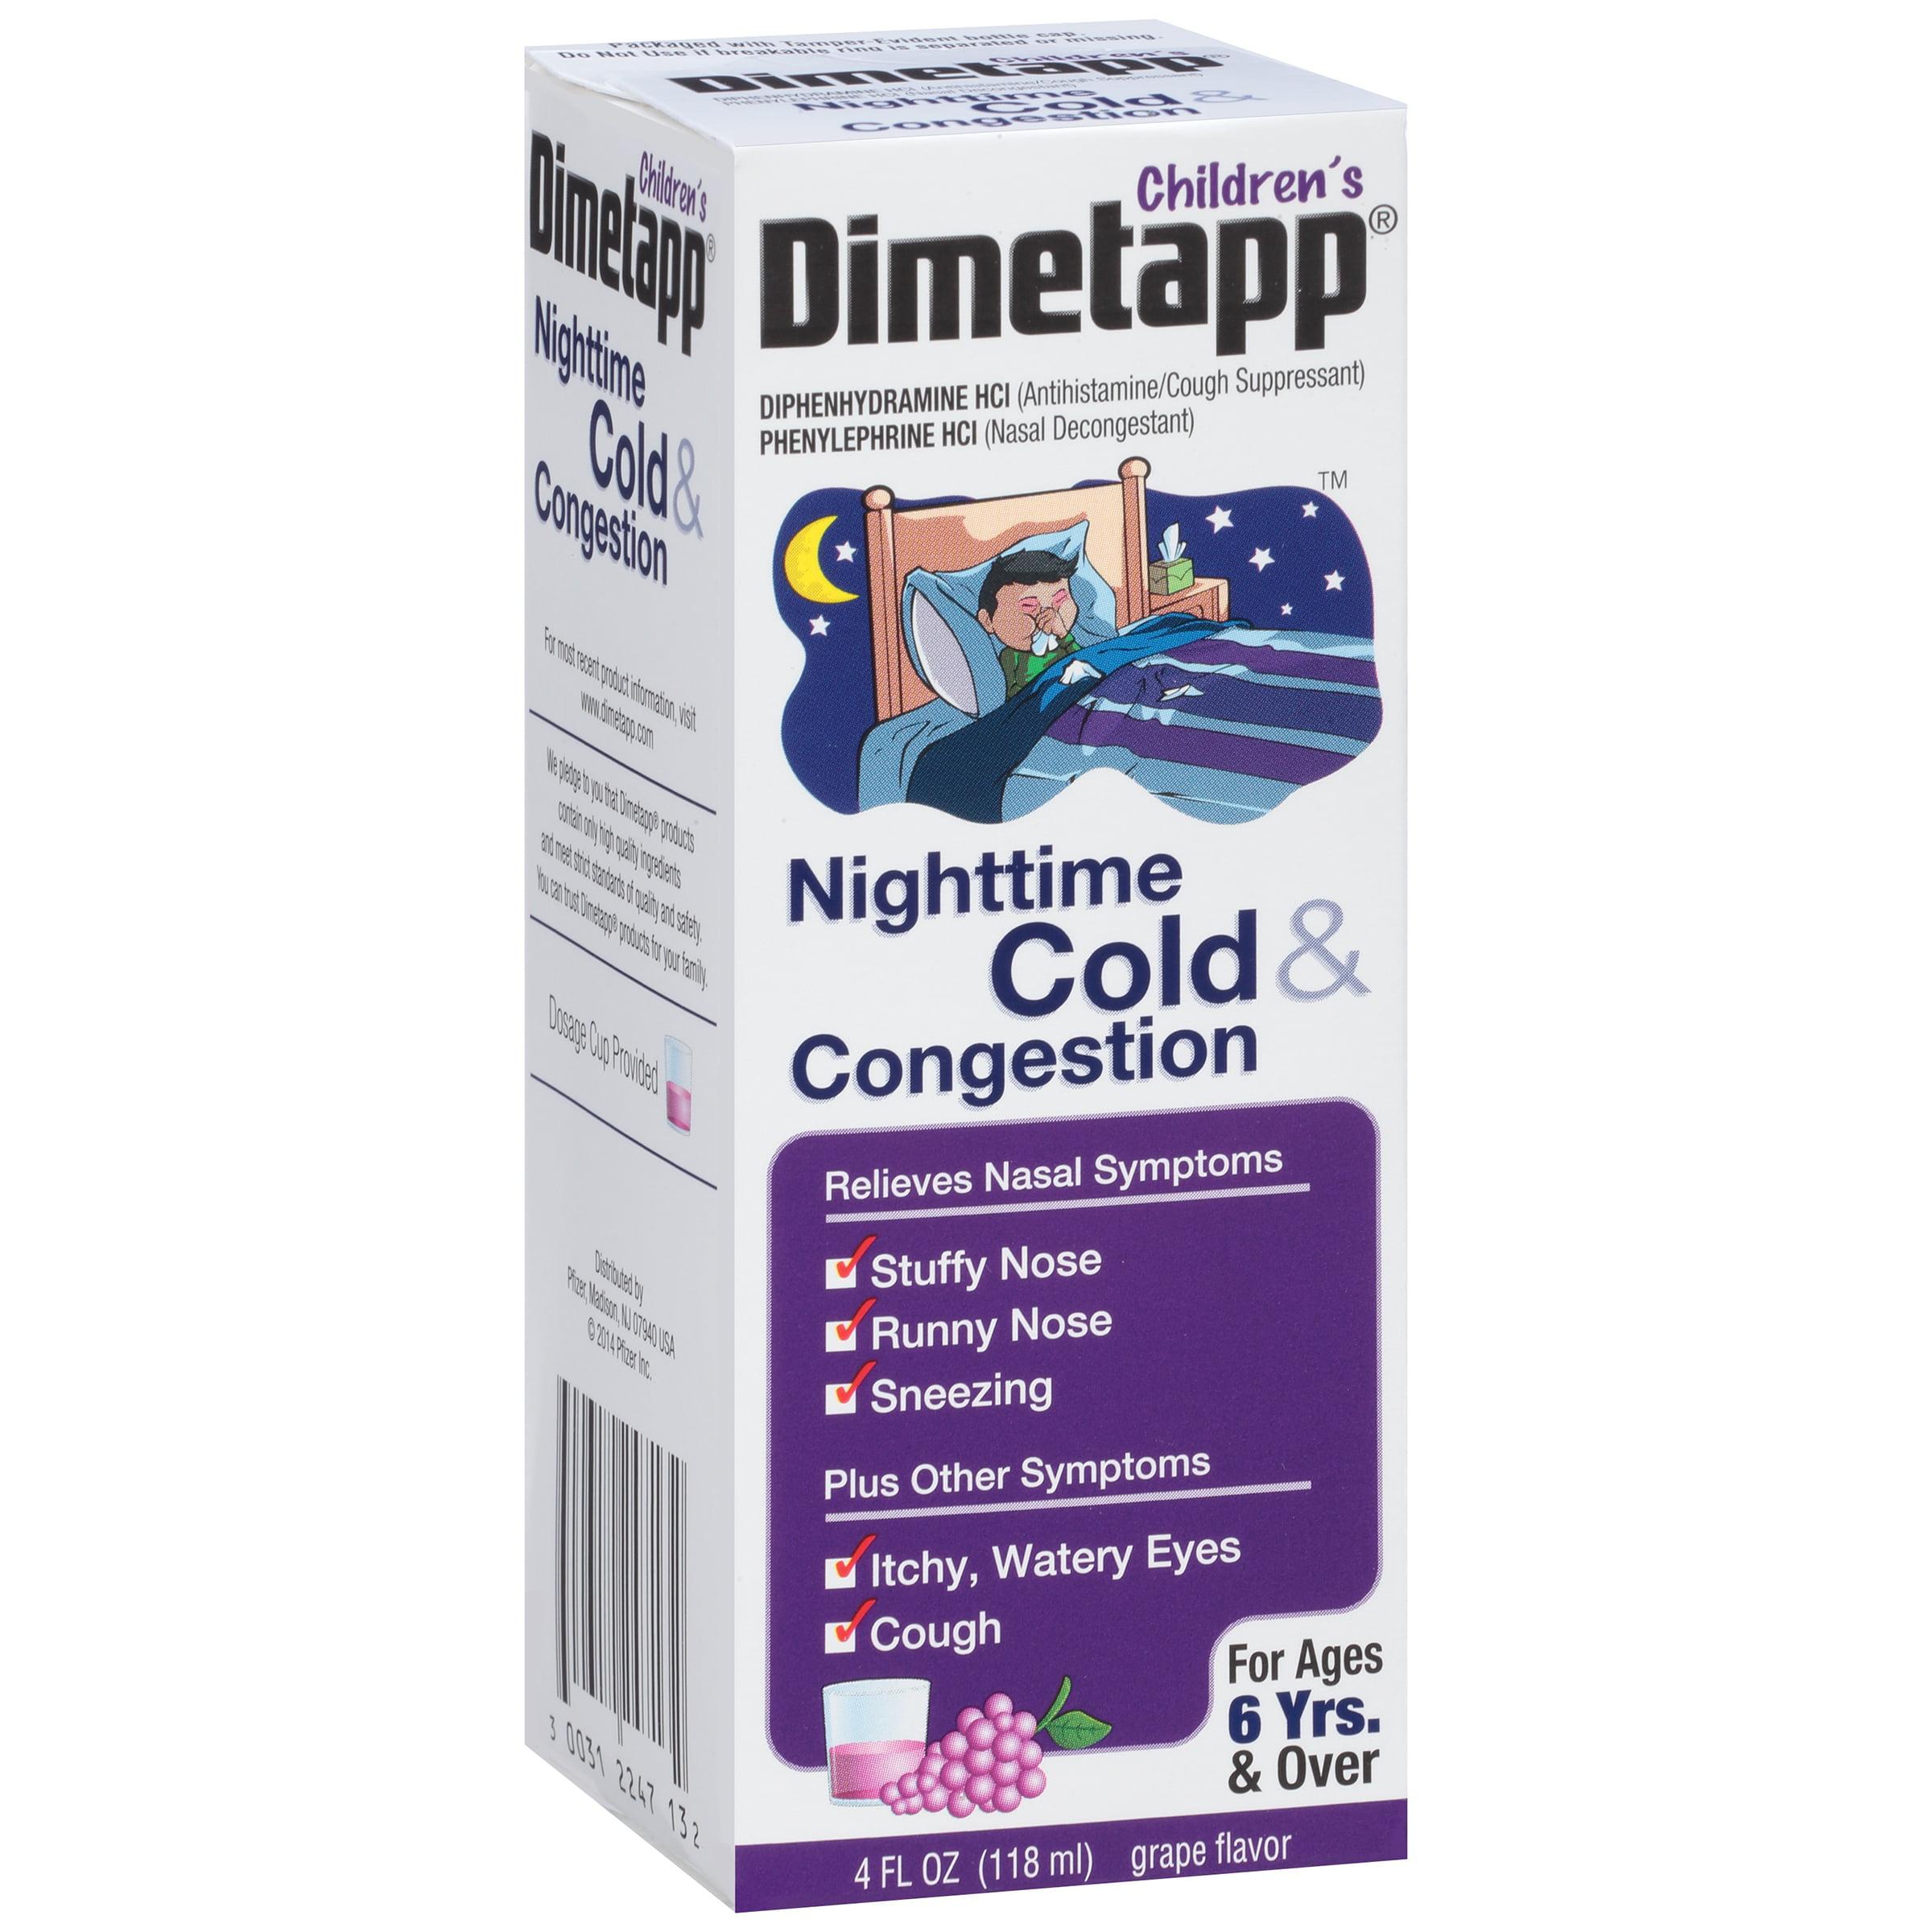 Children's Dimetapp ® Nighttime Cold & Congestion Antihistamine/Cough Suppressant & Decongestant Liquid 4 fl. oz. Box